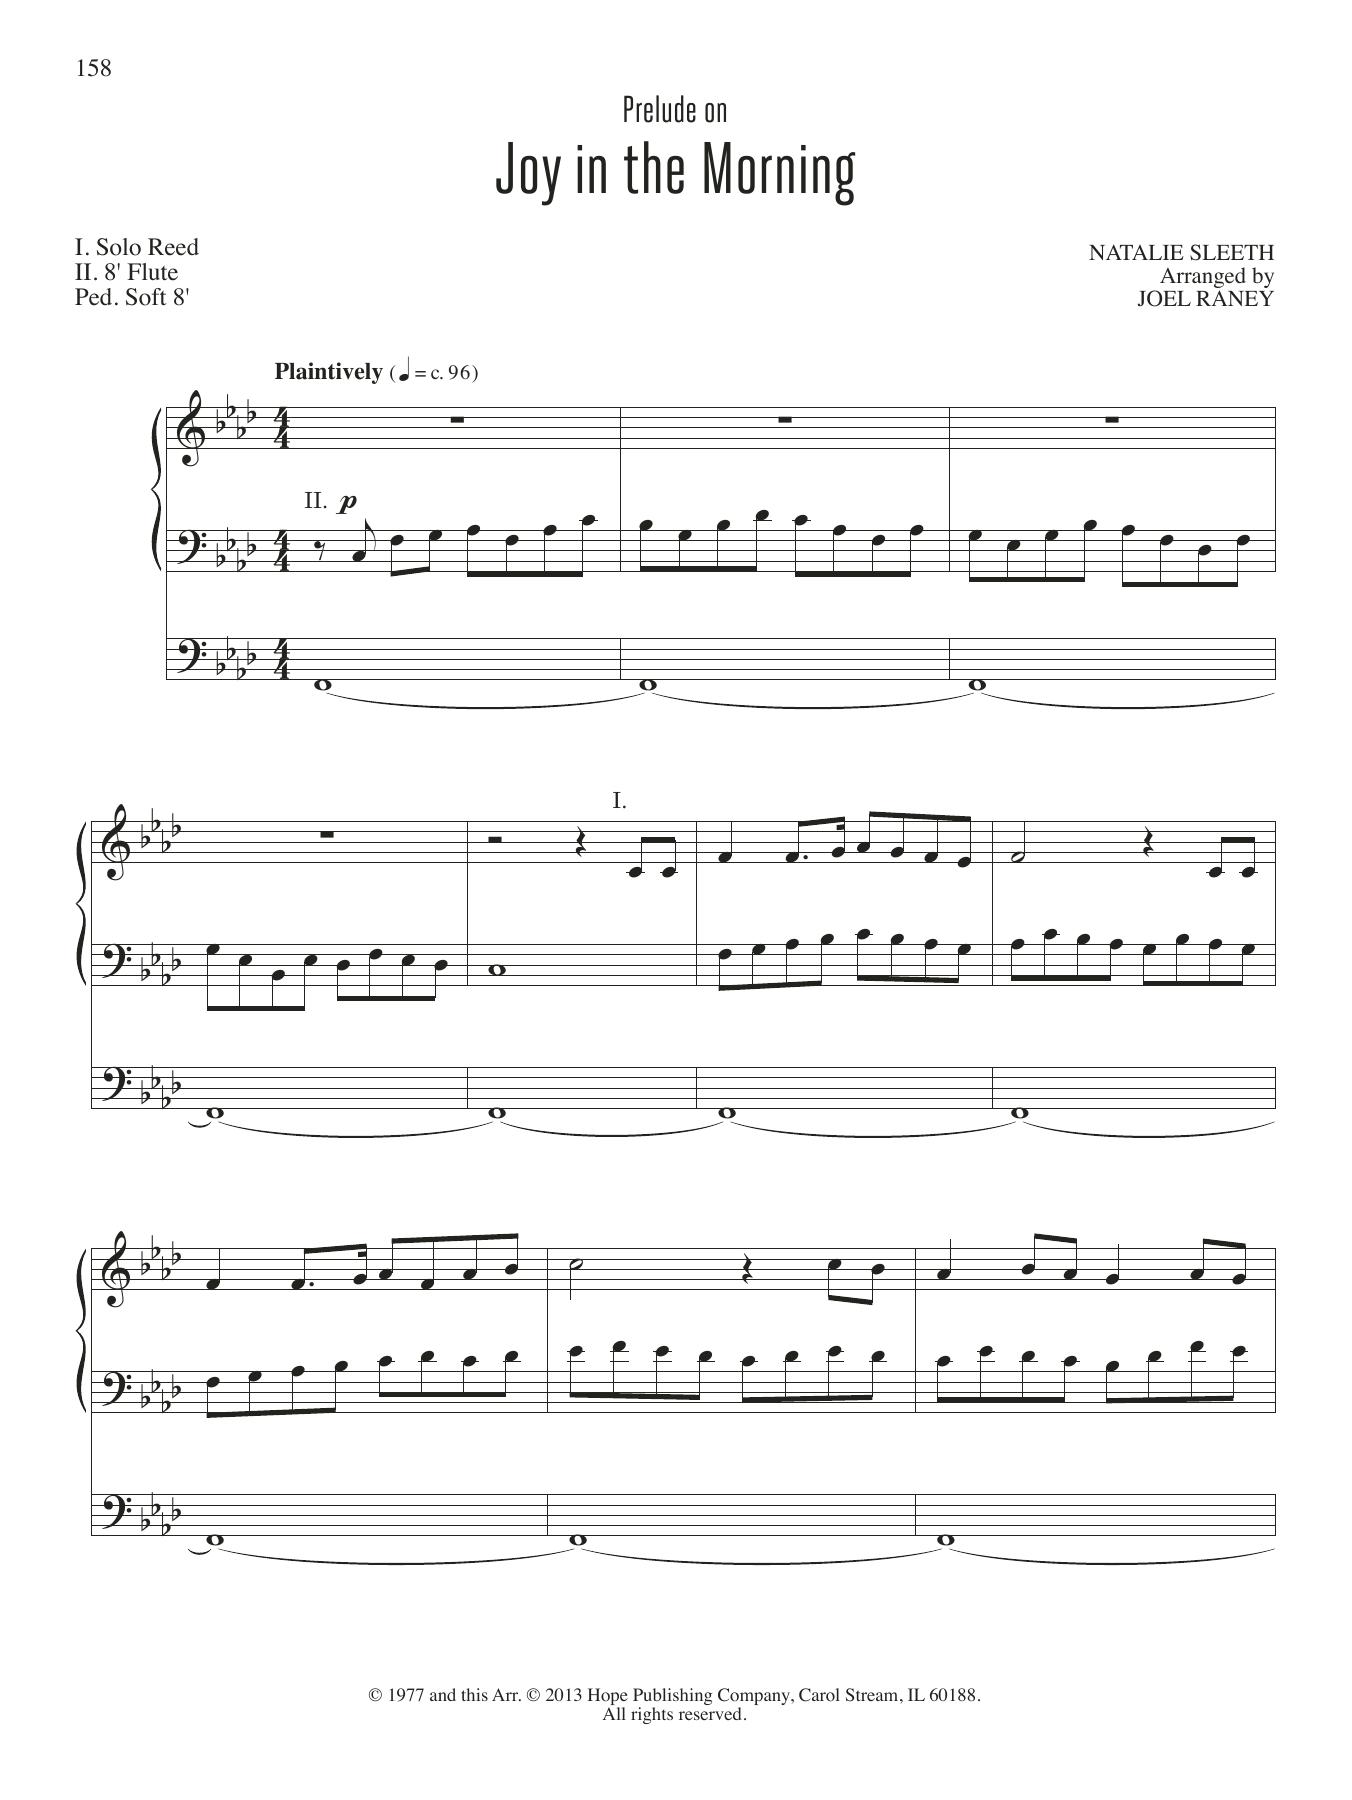 Joy in the Morning Sheet Music